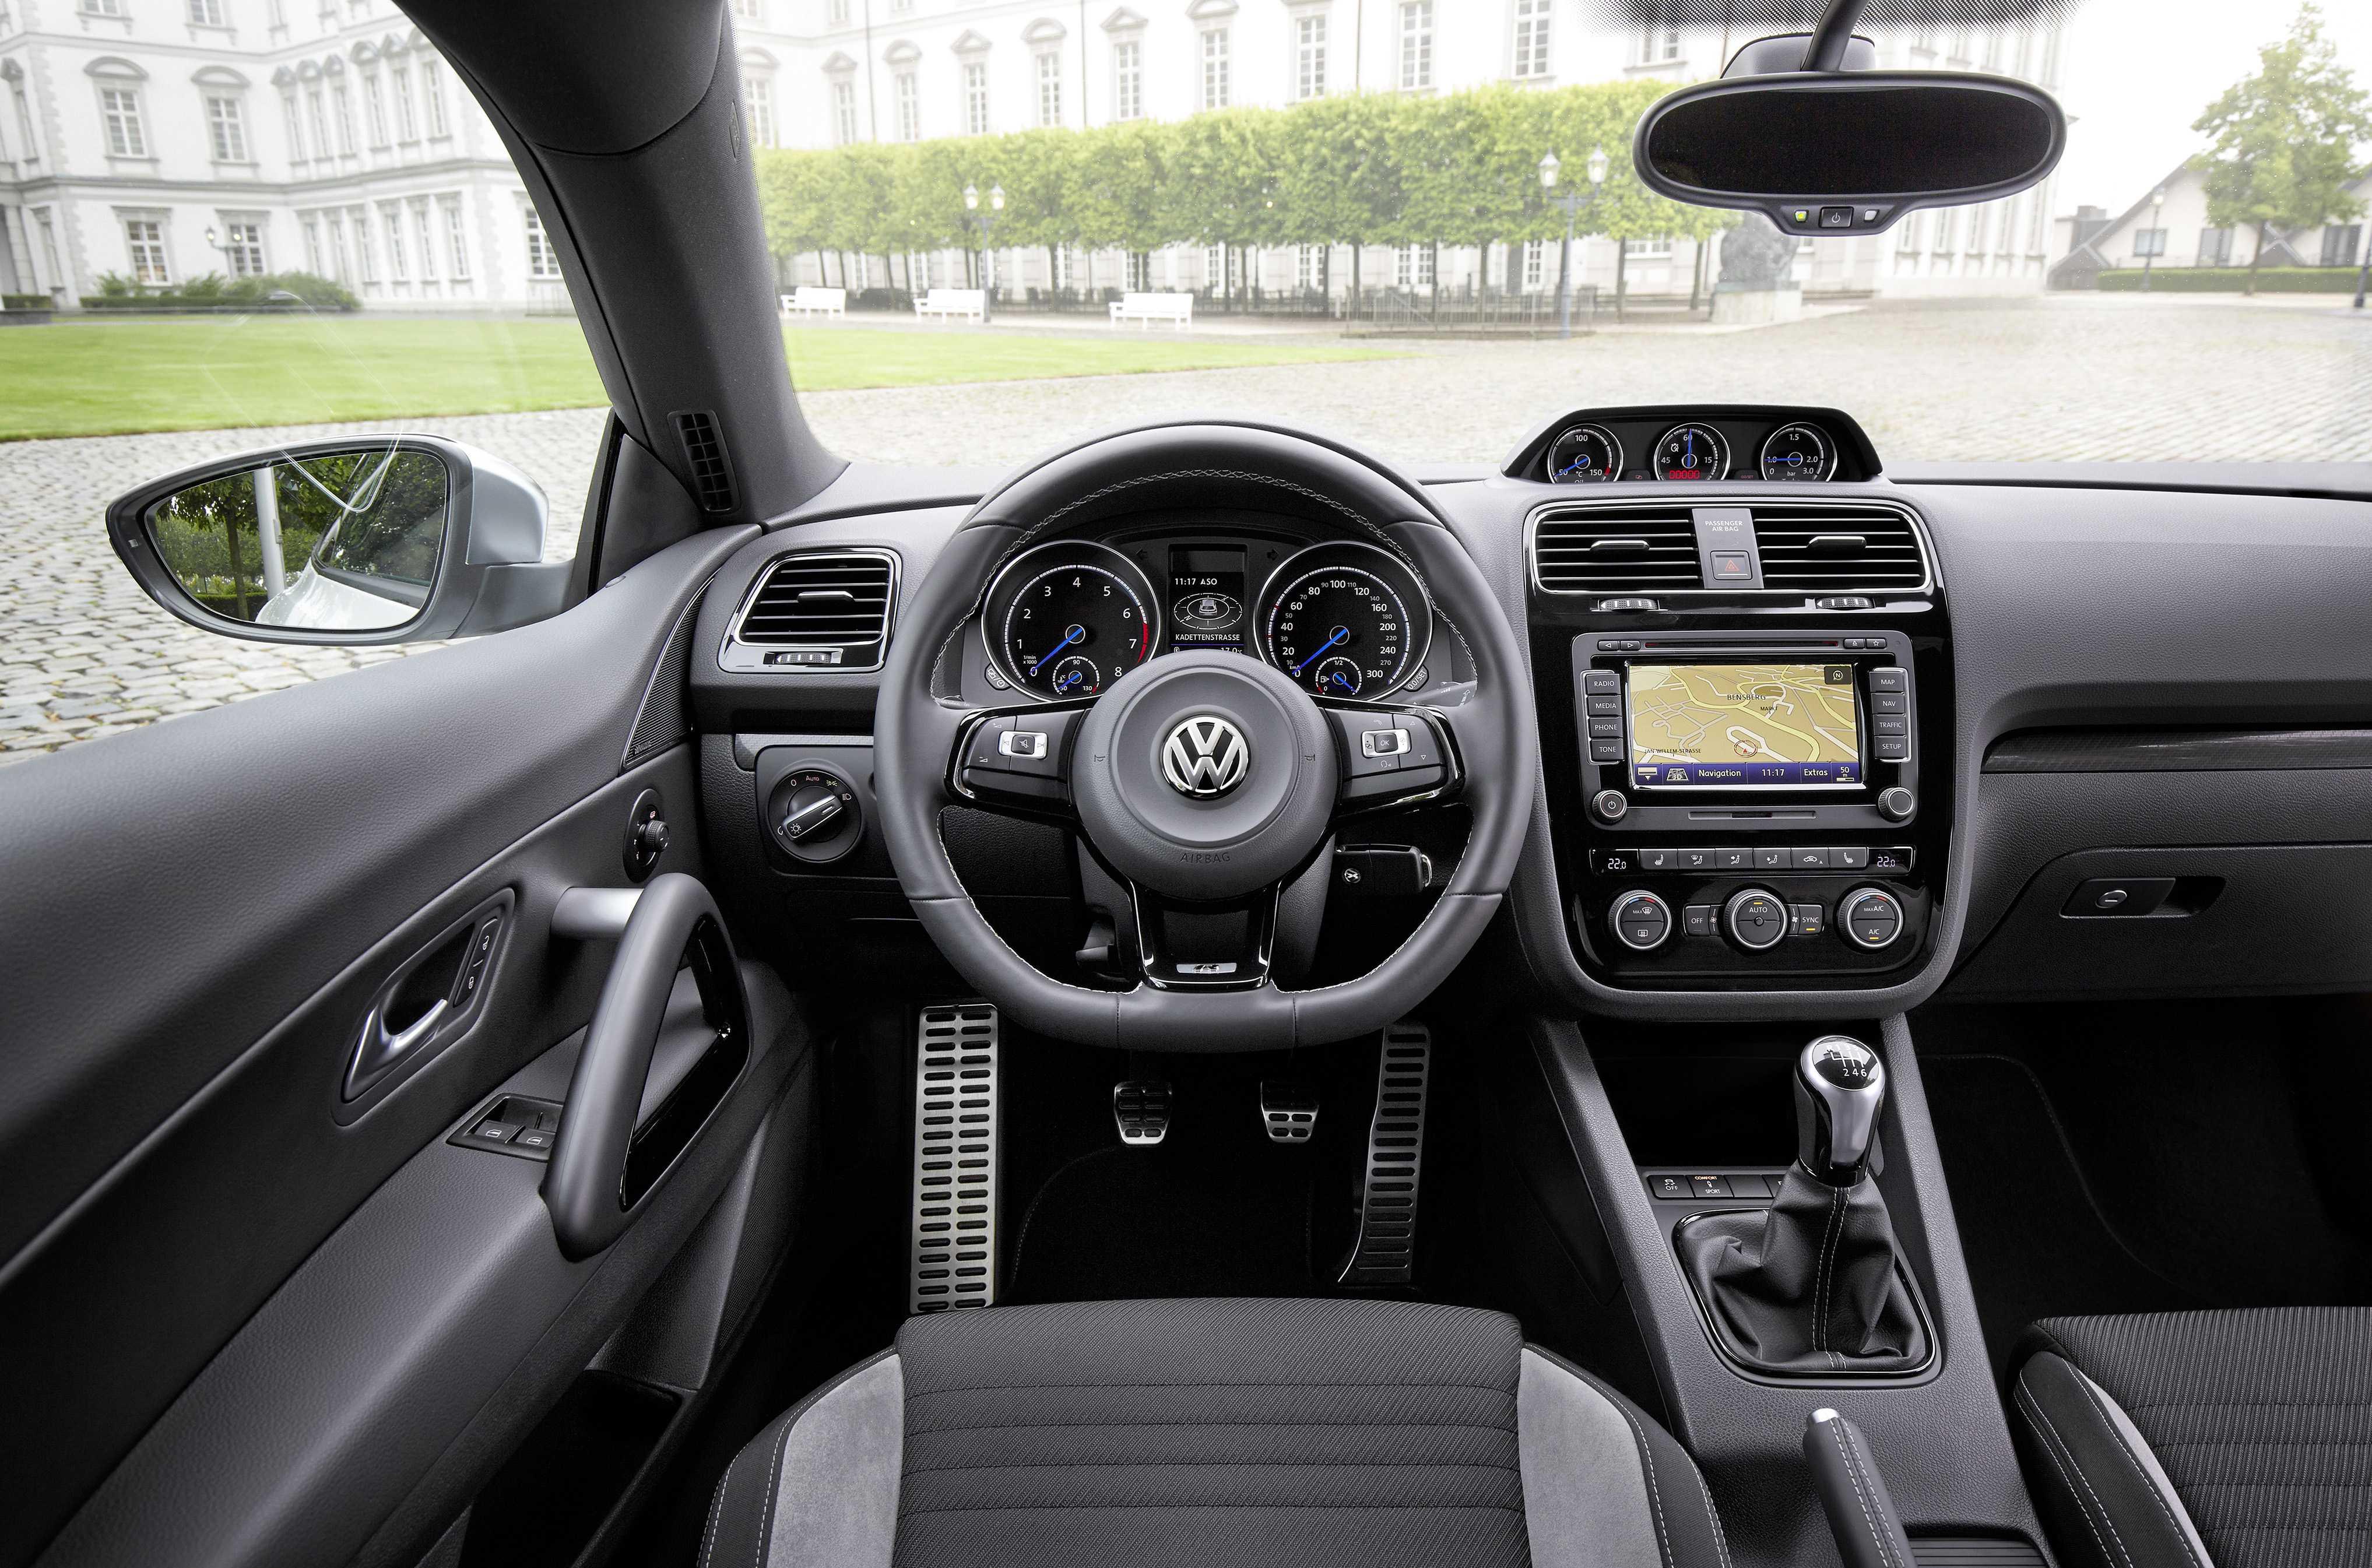 https://s.car.info/image_files/full/volkswagen-scirocco-interior-0-191414.jpg